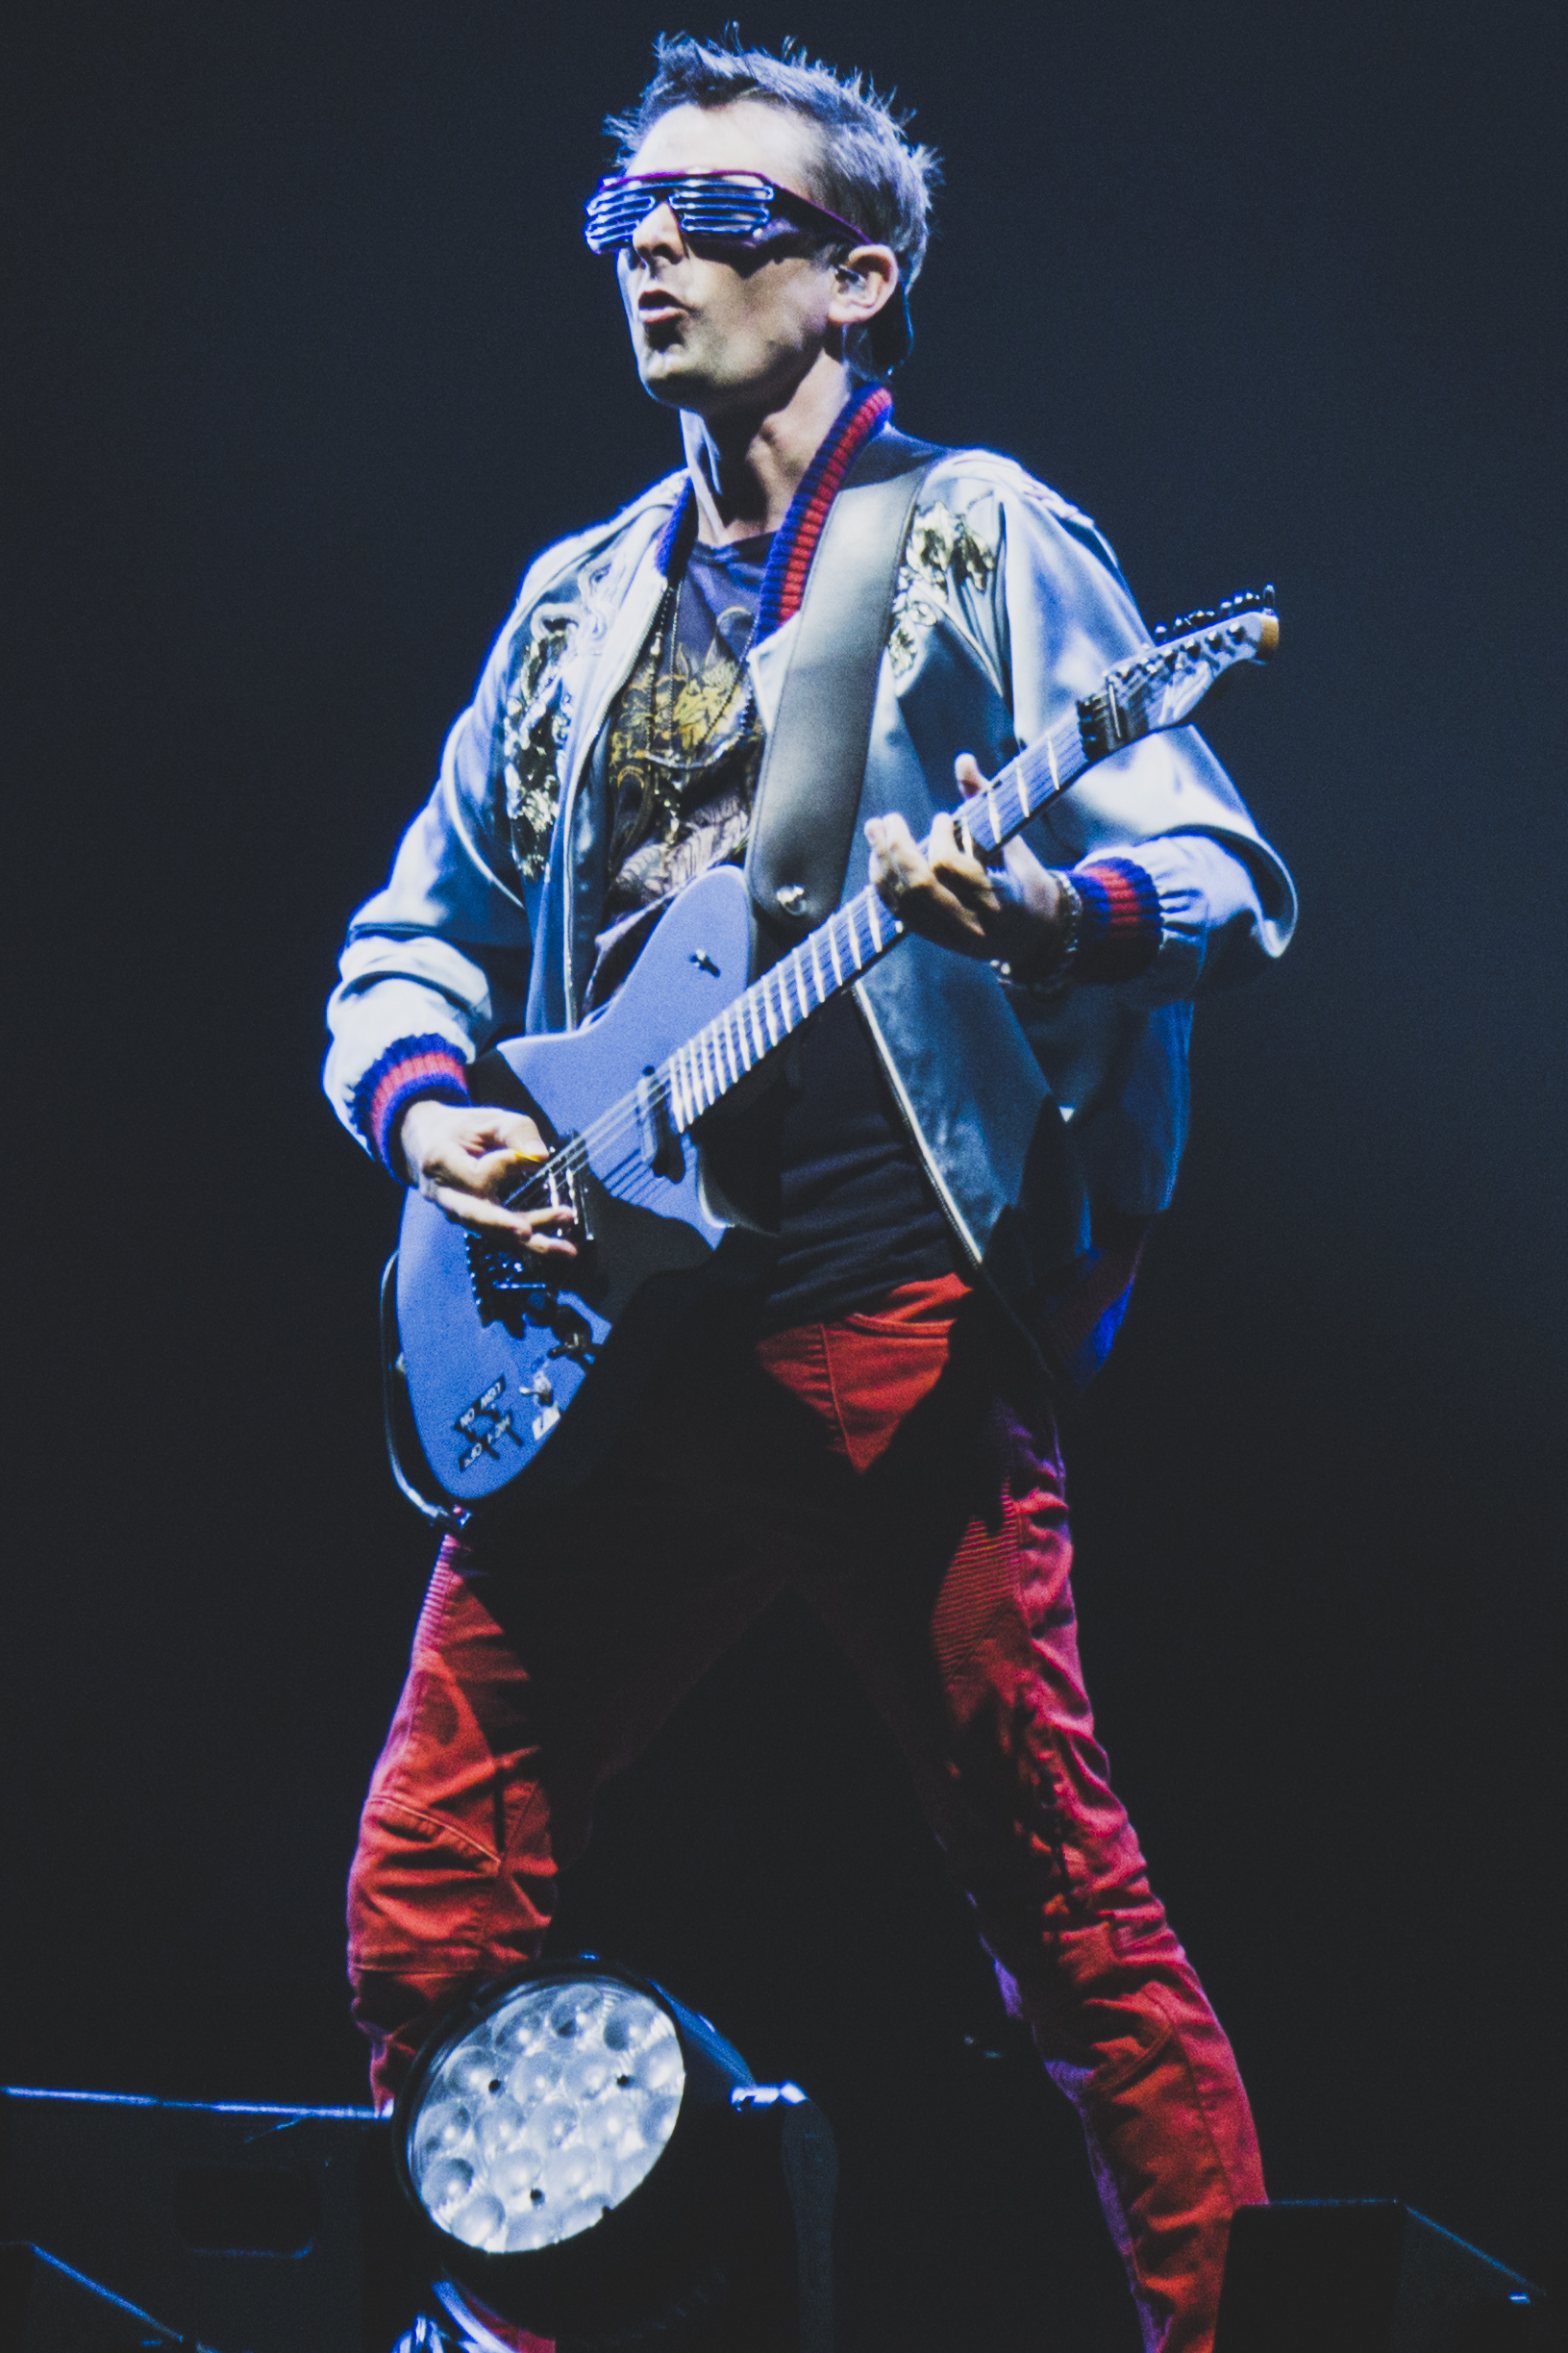 rencontres des guitares royales Drew Barrymore Dating 2013